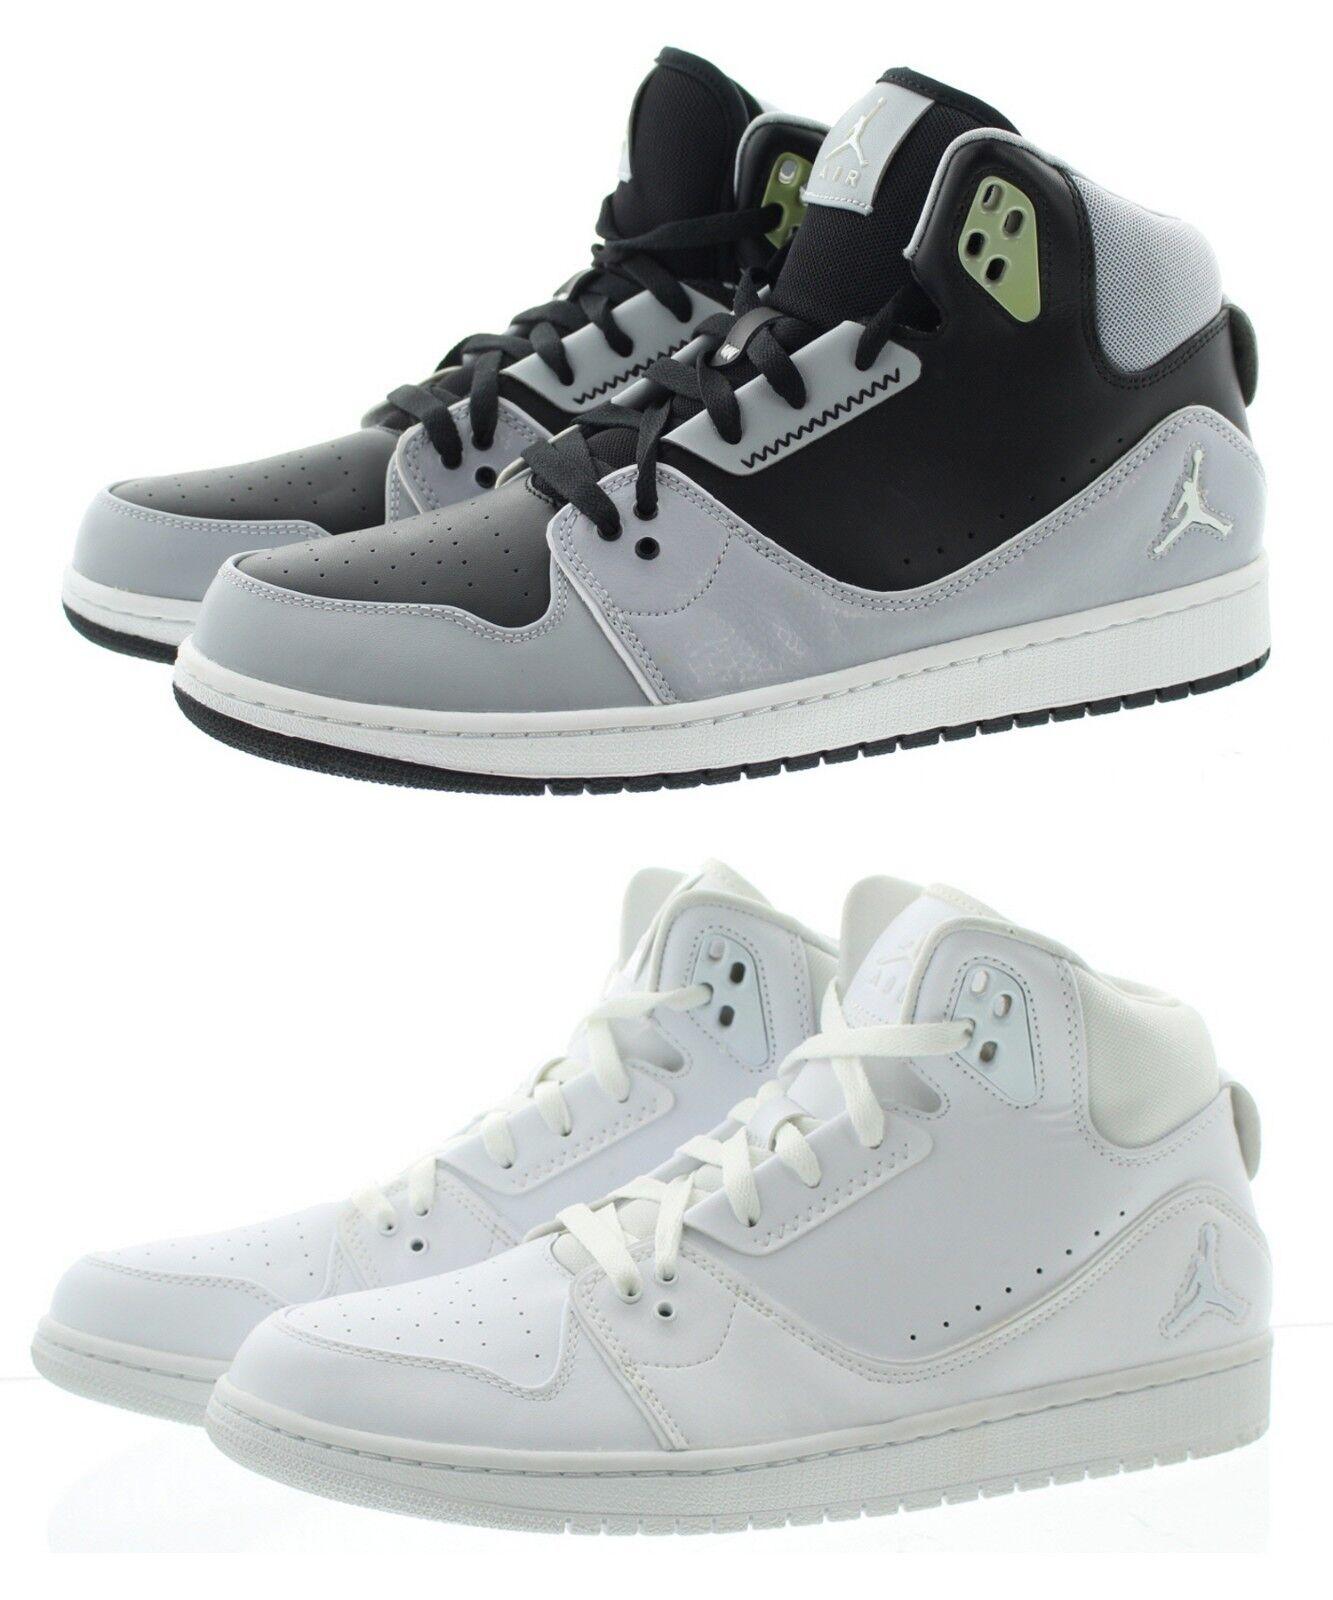 Nike 555798 Mens Air Jordan 1 Flight 2 High Top Basketball Trainer shoes